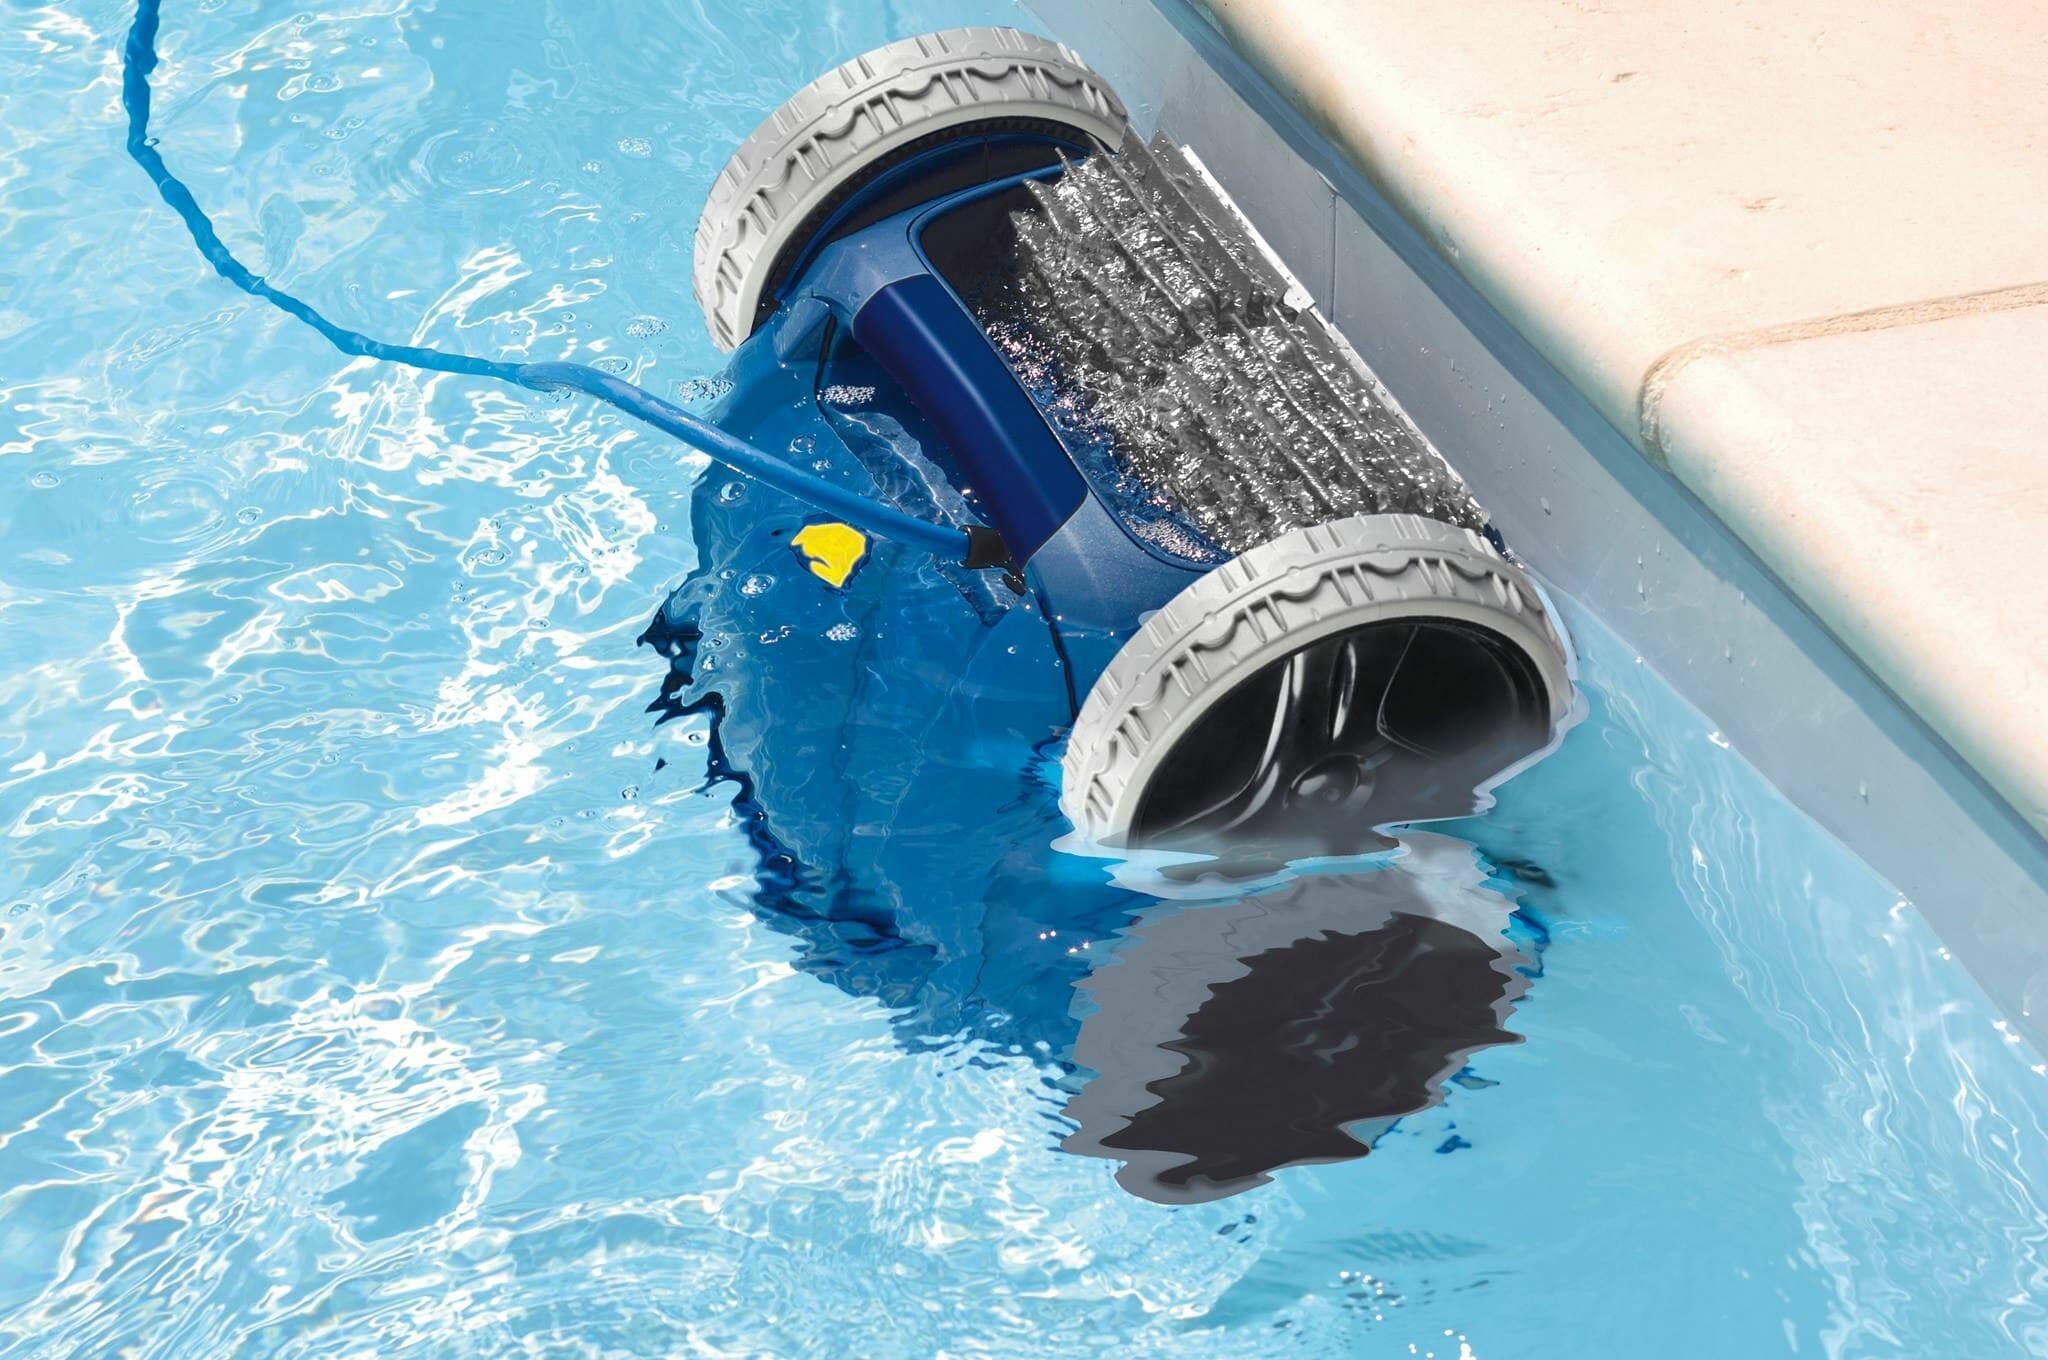 robotic pool cleaner under water